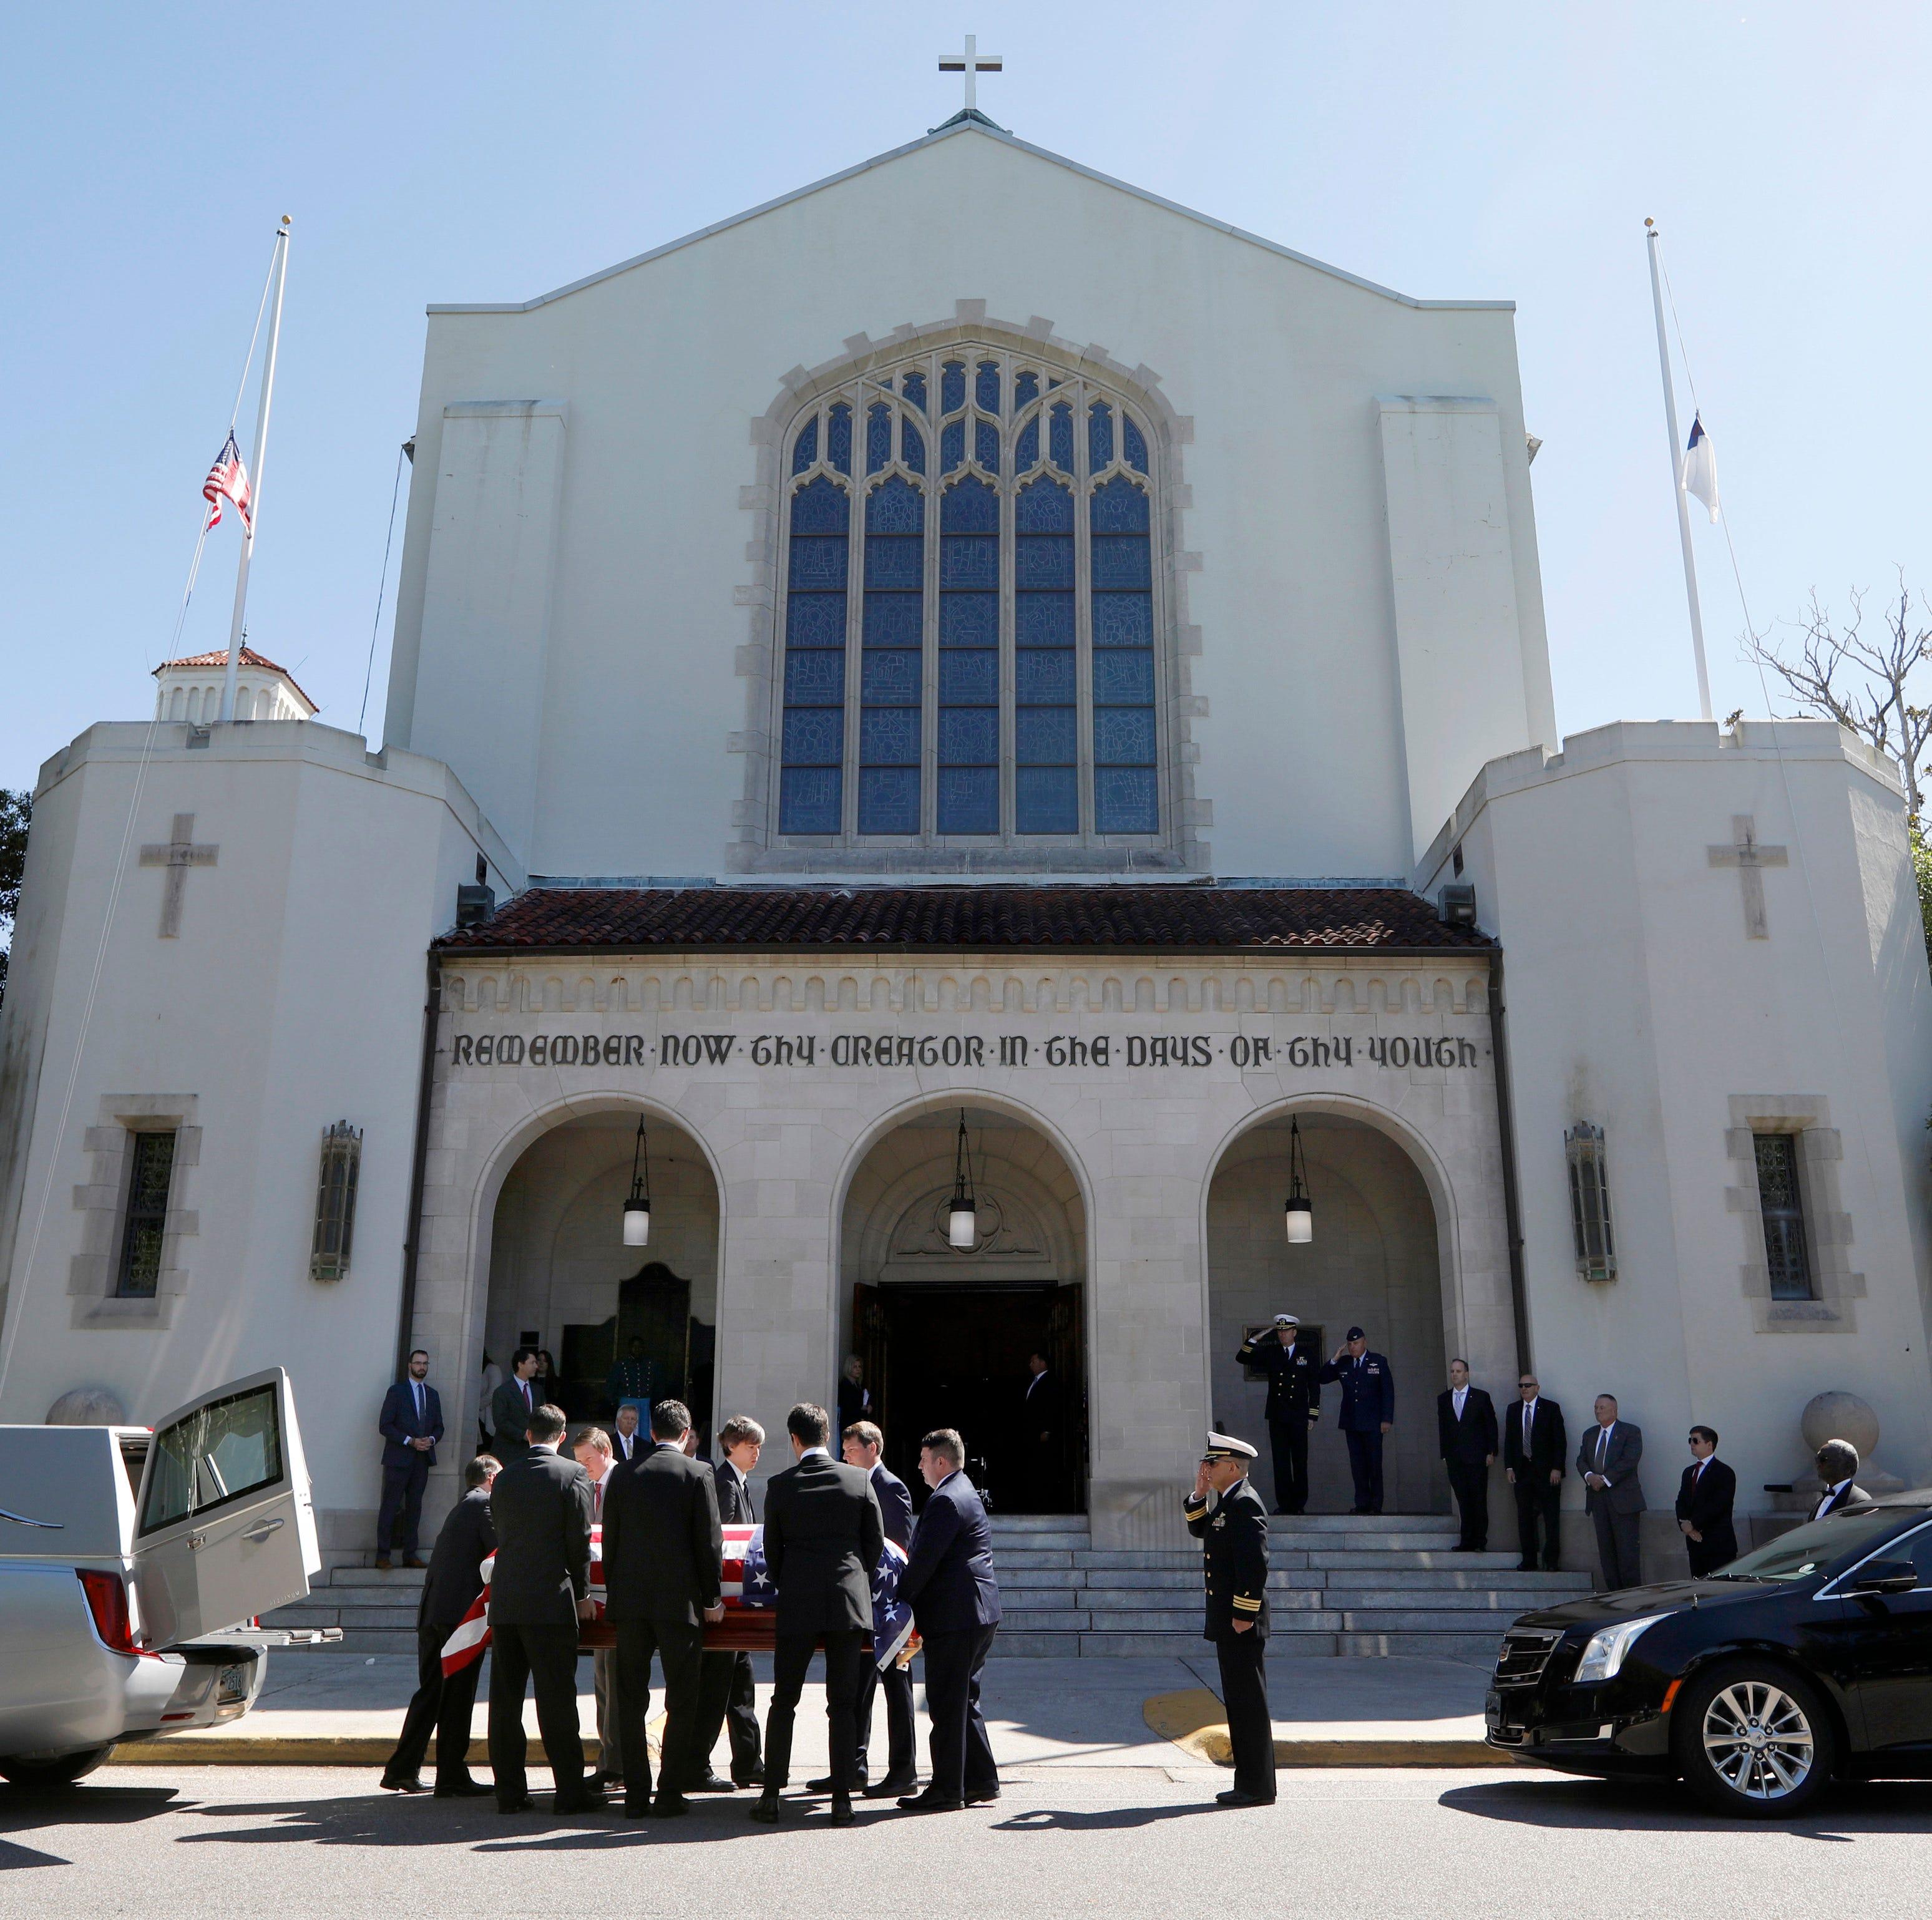 Joe Biden, Jim Clyburn speak at funeral of former US senator from SC Fritz Hollings